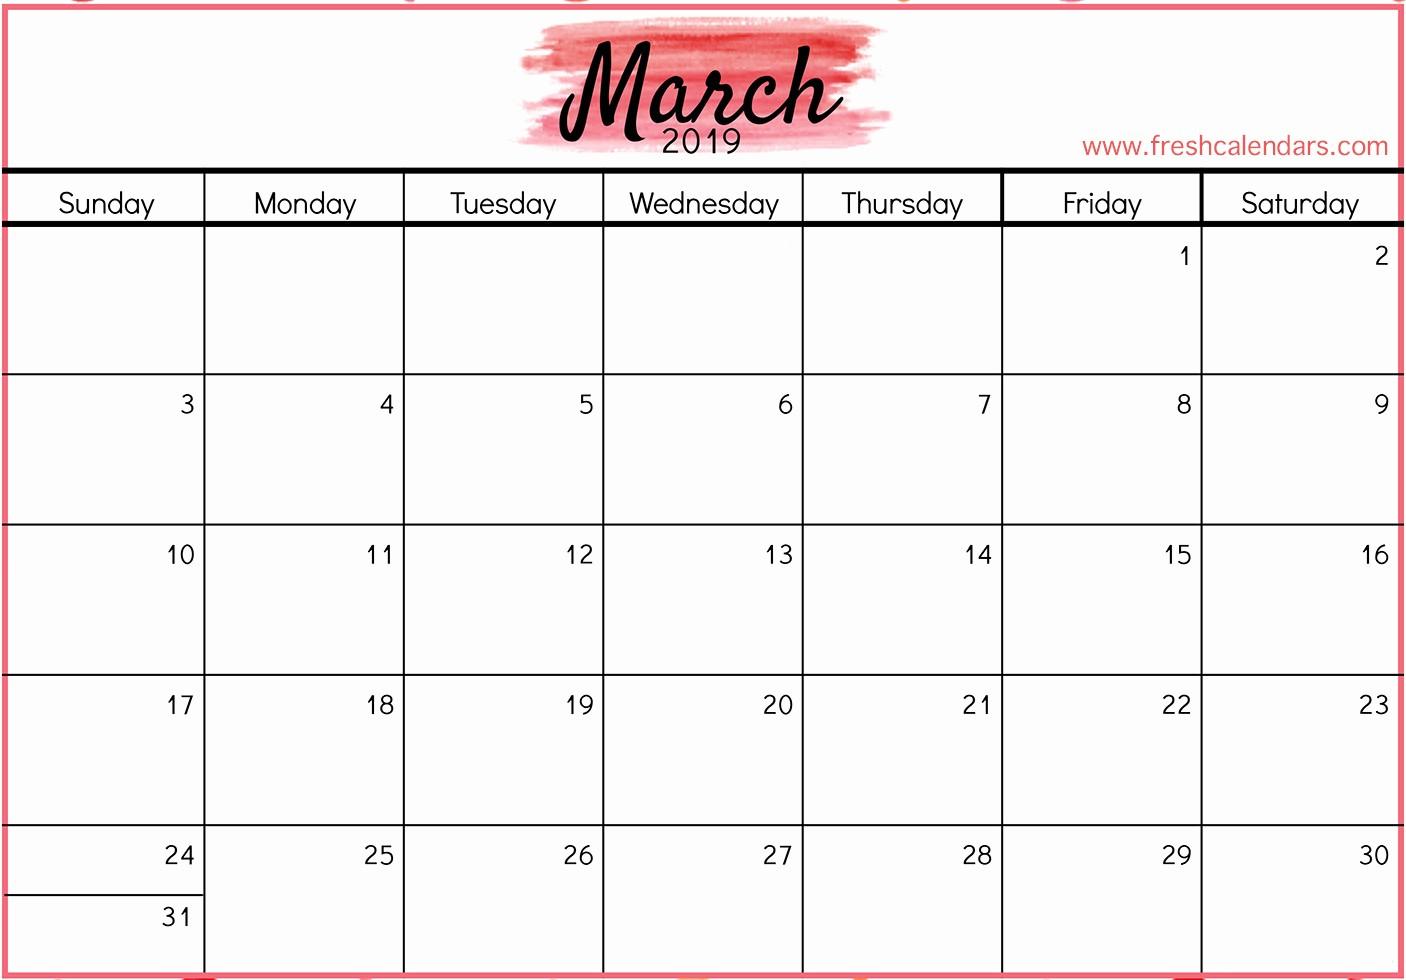 Free Printable Weekly Calendar 2019 Inspirational Printable March 2019 Calendar Fresh Calendars